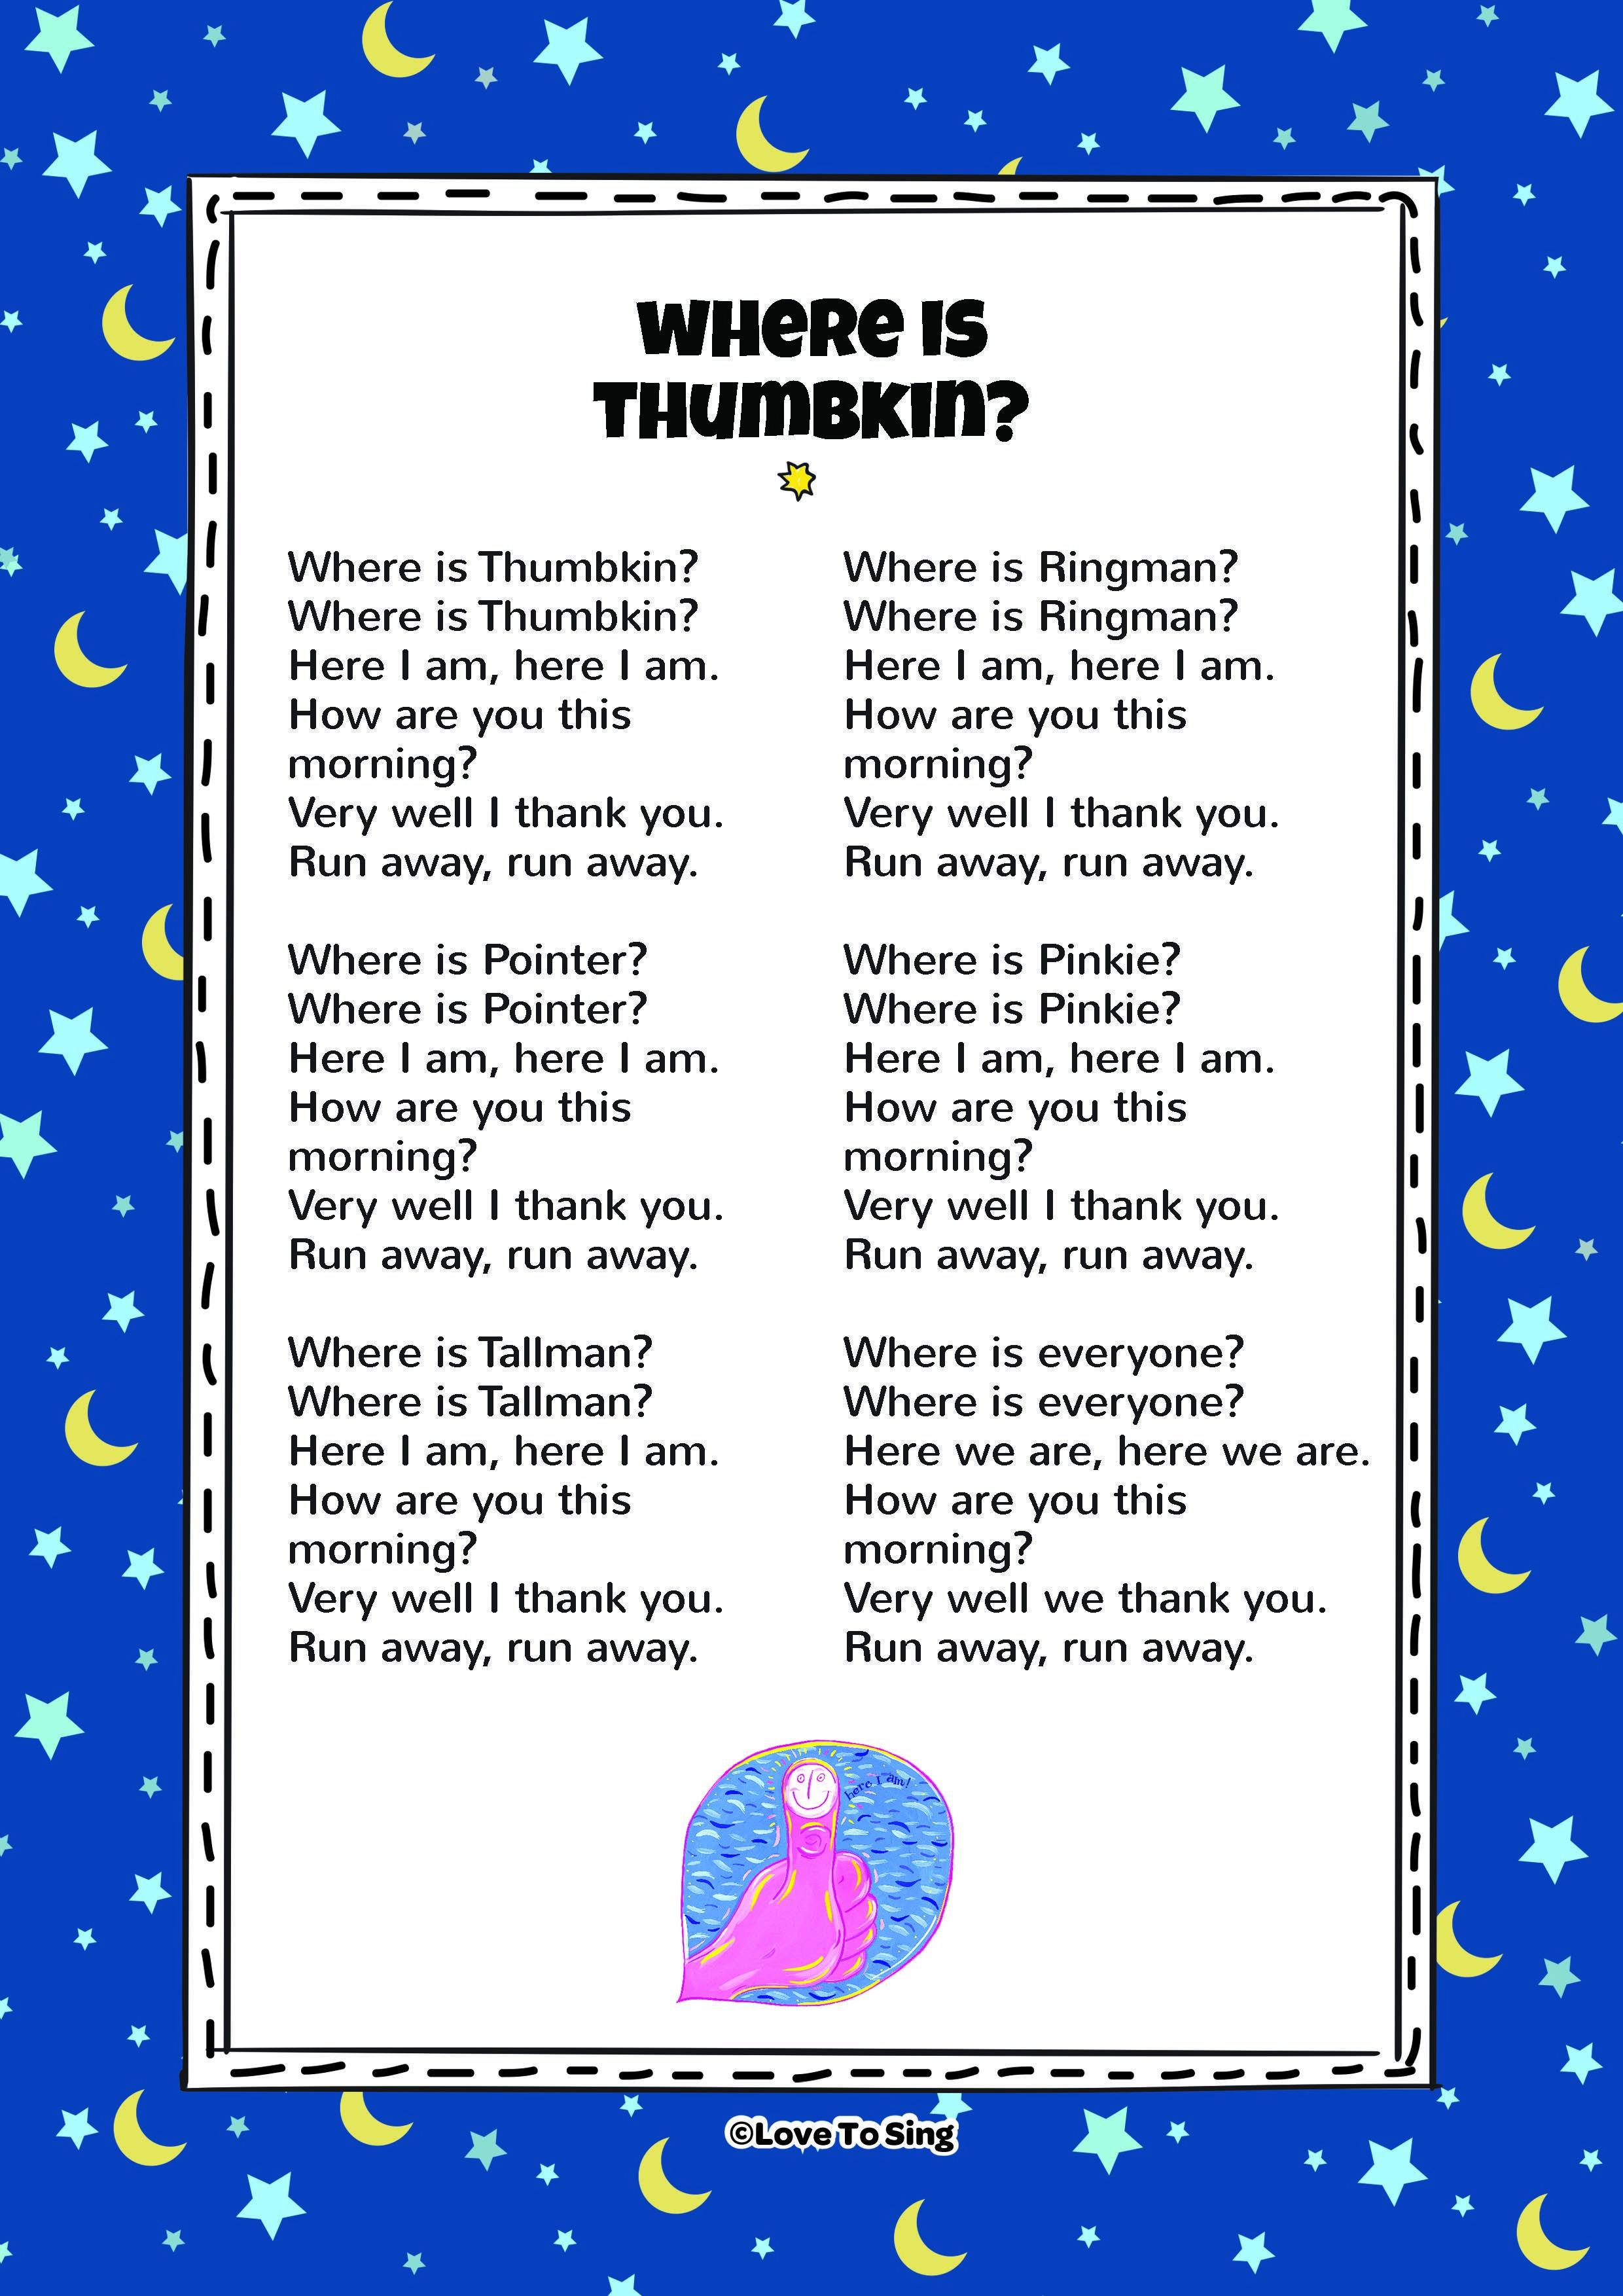 Where Is Thumbkin Nursery Rhyme Kids Will Love This Fun